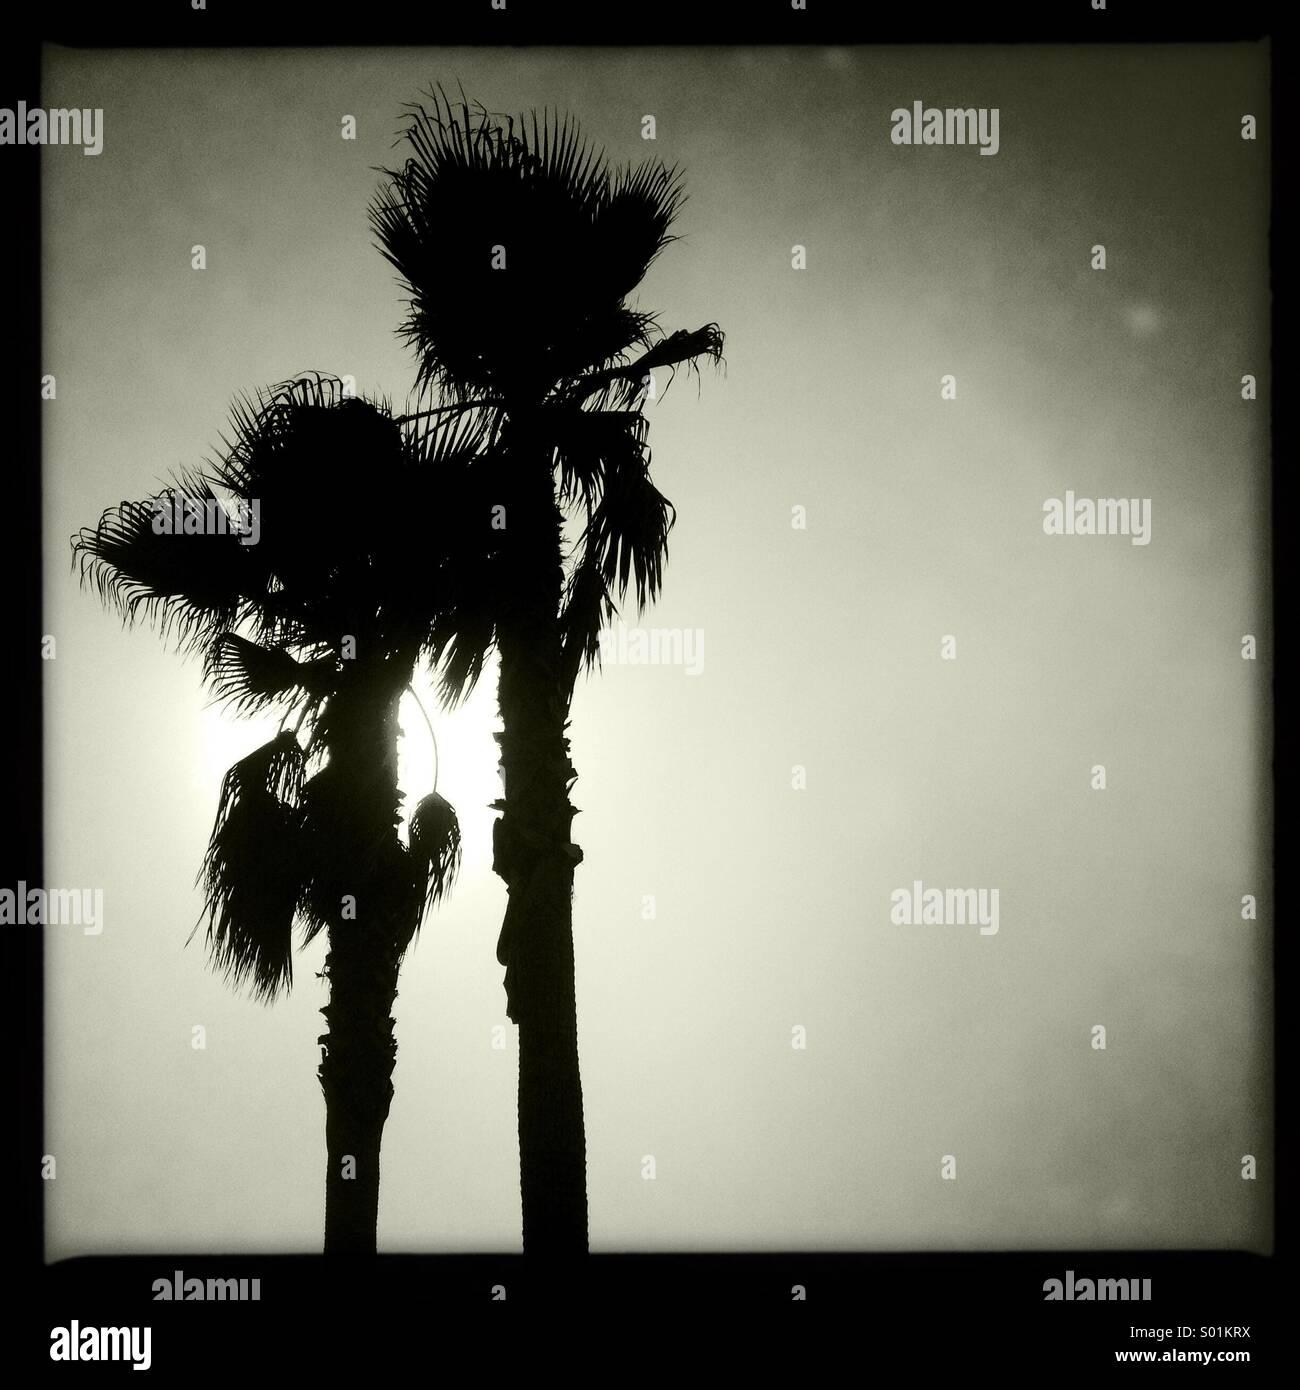 Silhouette of palm trees on Venice Beach, California. - Stock Image